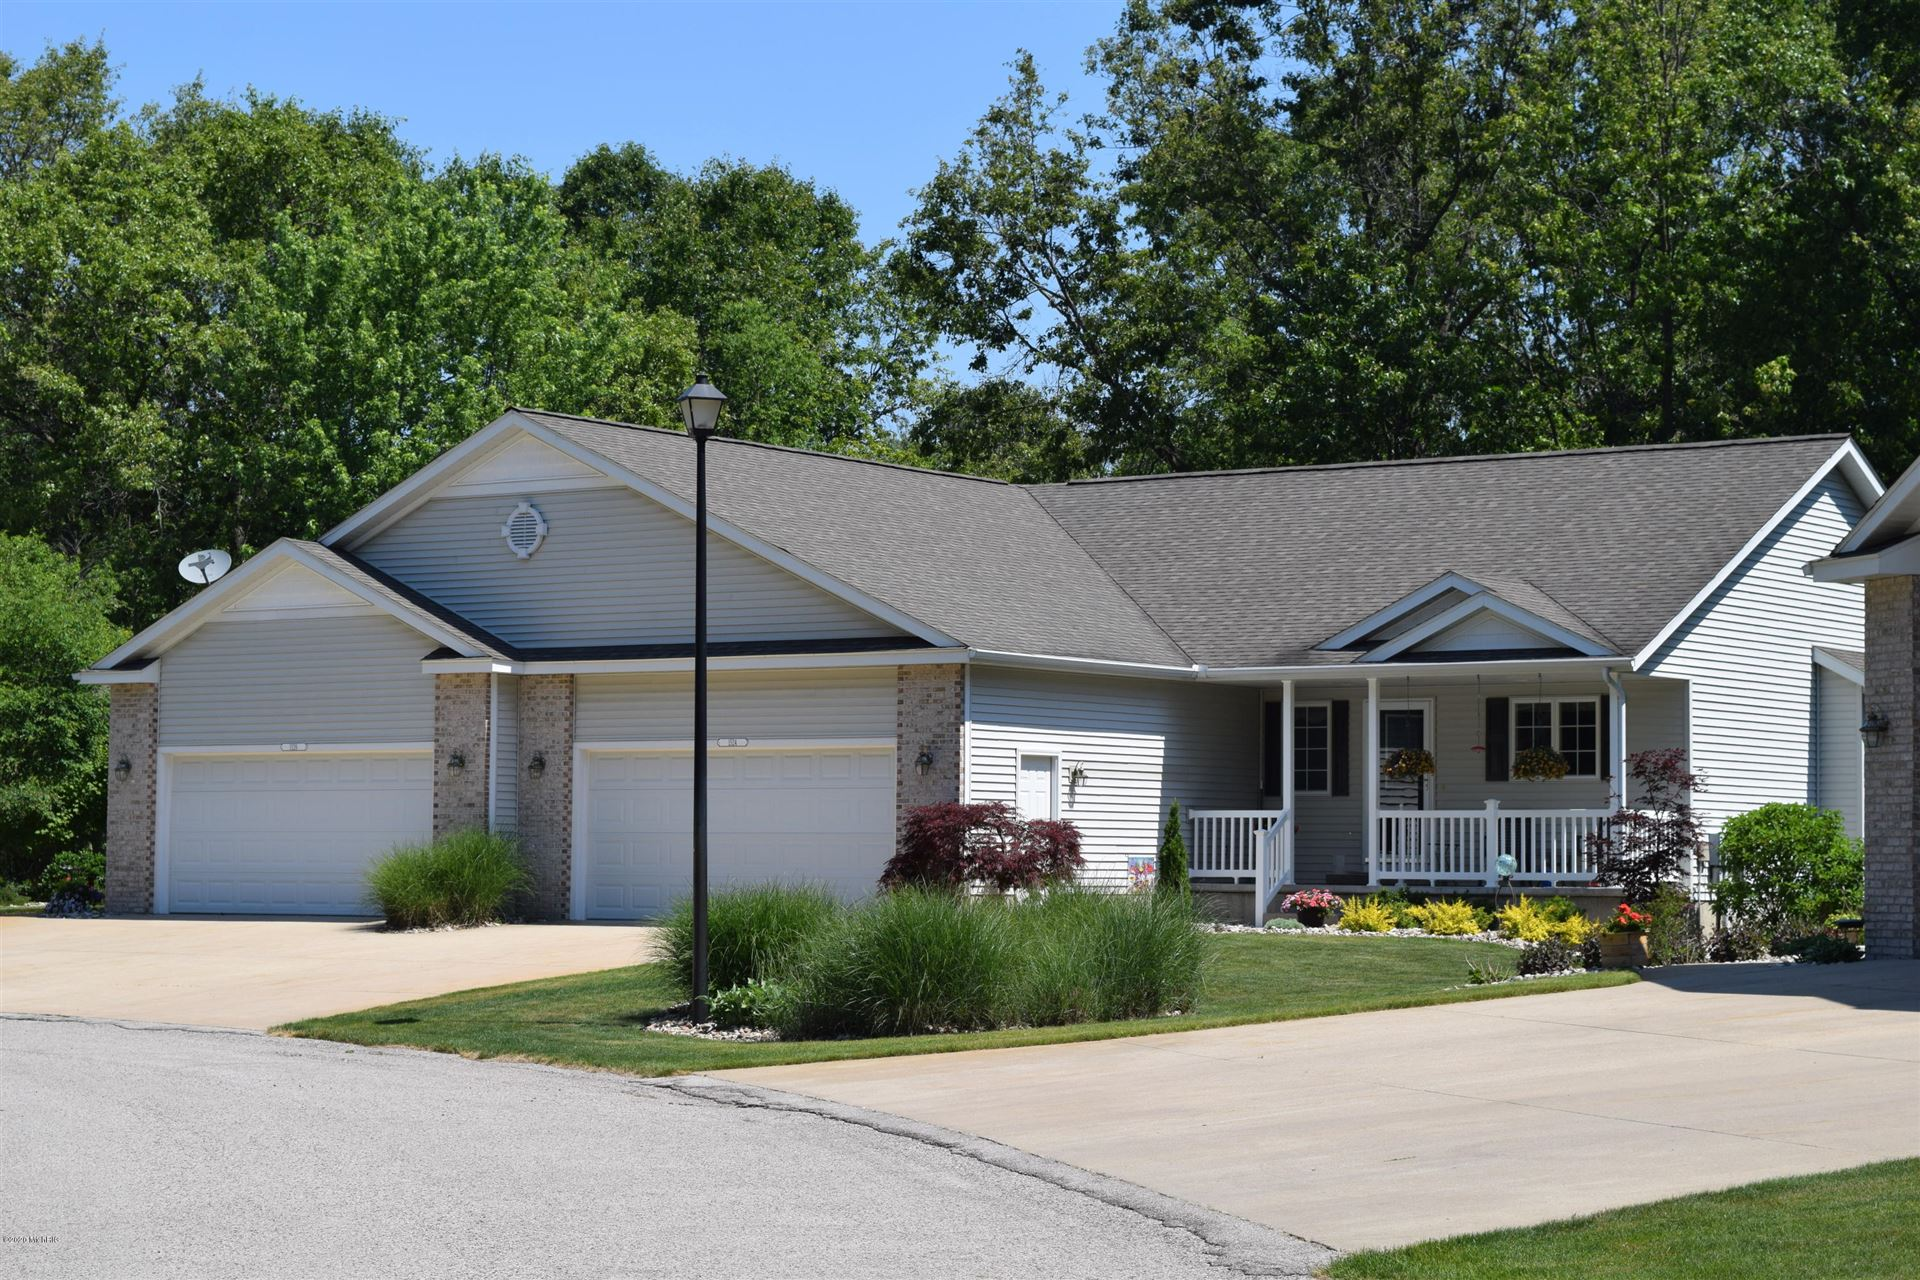 1421 E Addison Way, Muskegon, MI 49445 - MLS#: 20023111